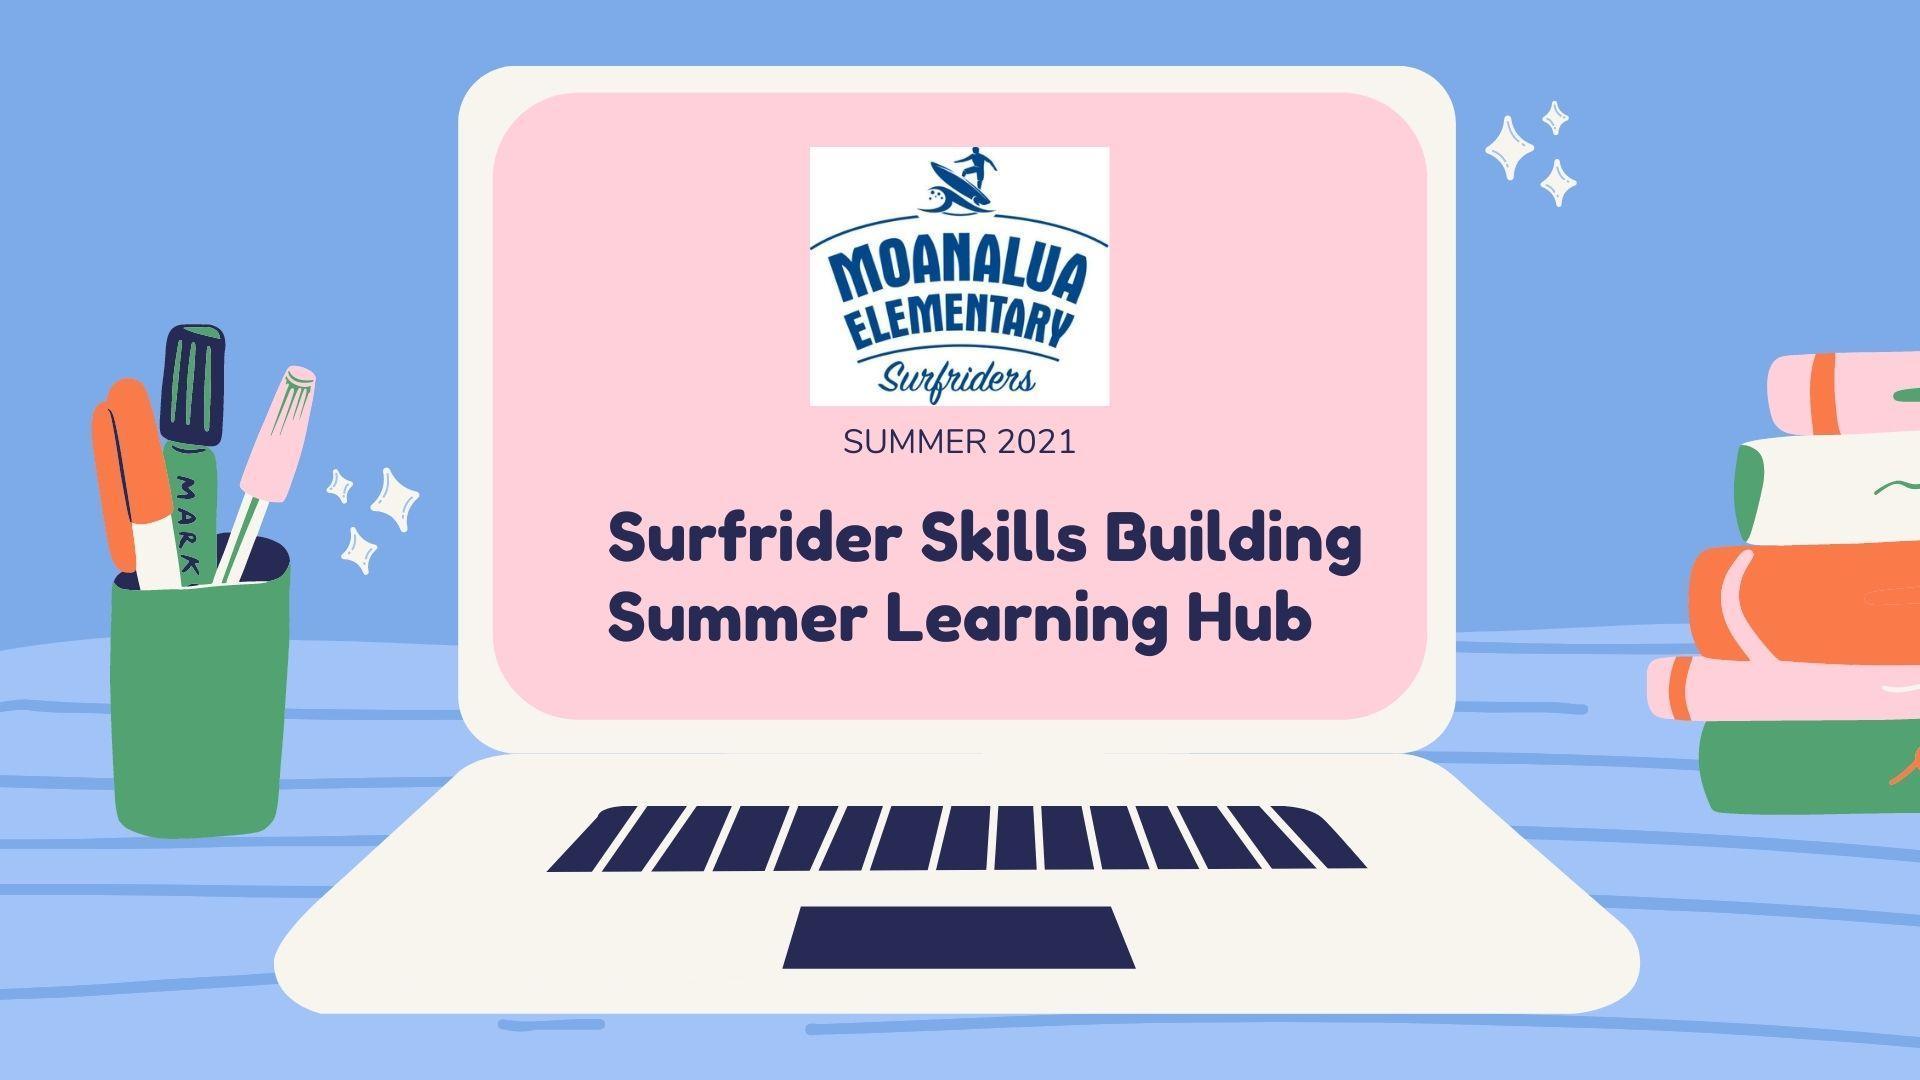 Summer learning hub 2021